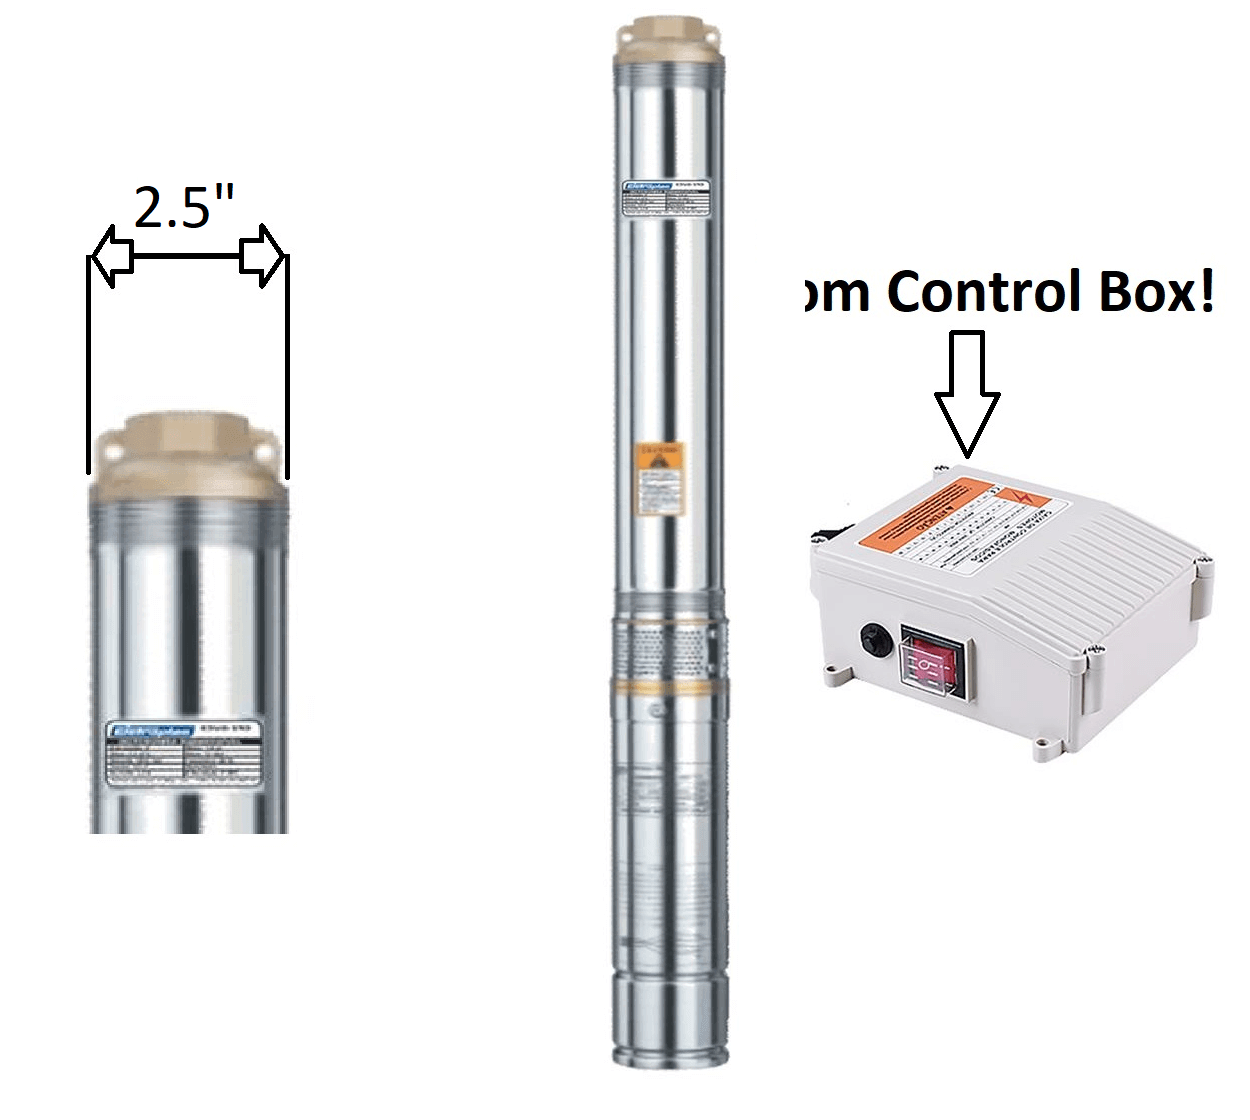 "Motobomba Submersa Caneta 1/2cv 2.5"" ESUB2.5/16 220V Eletroplas"